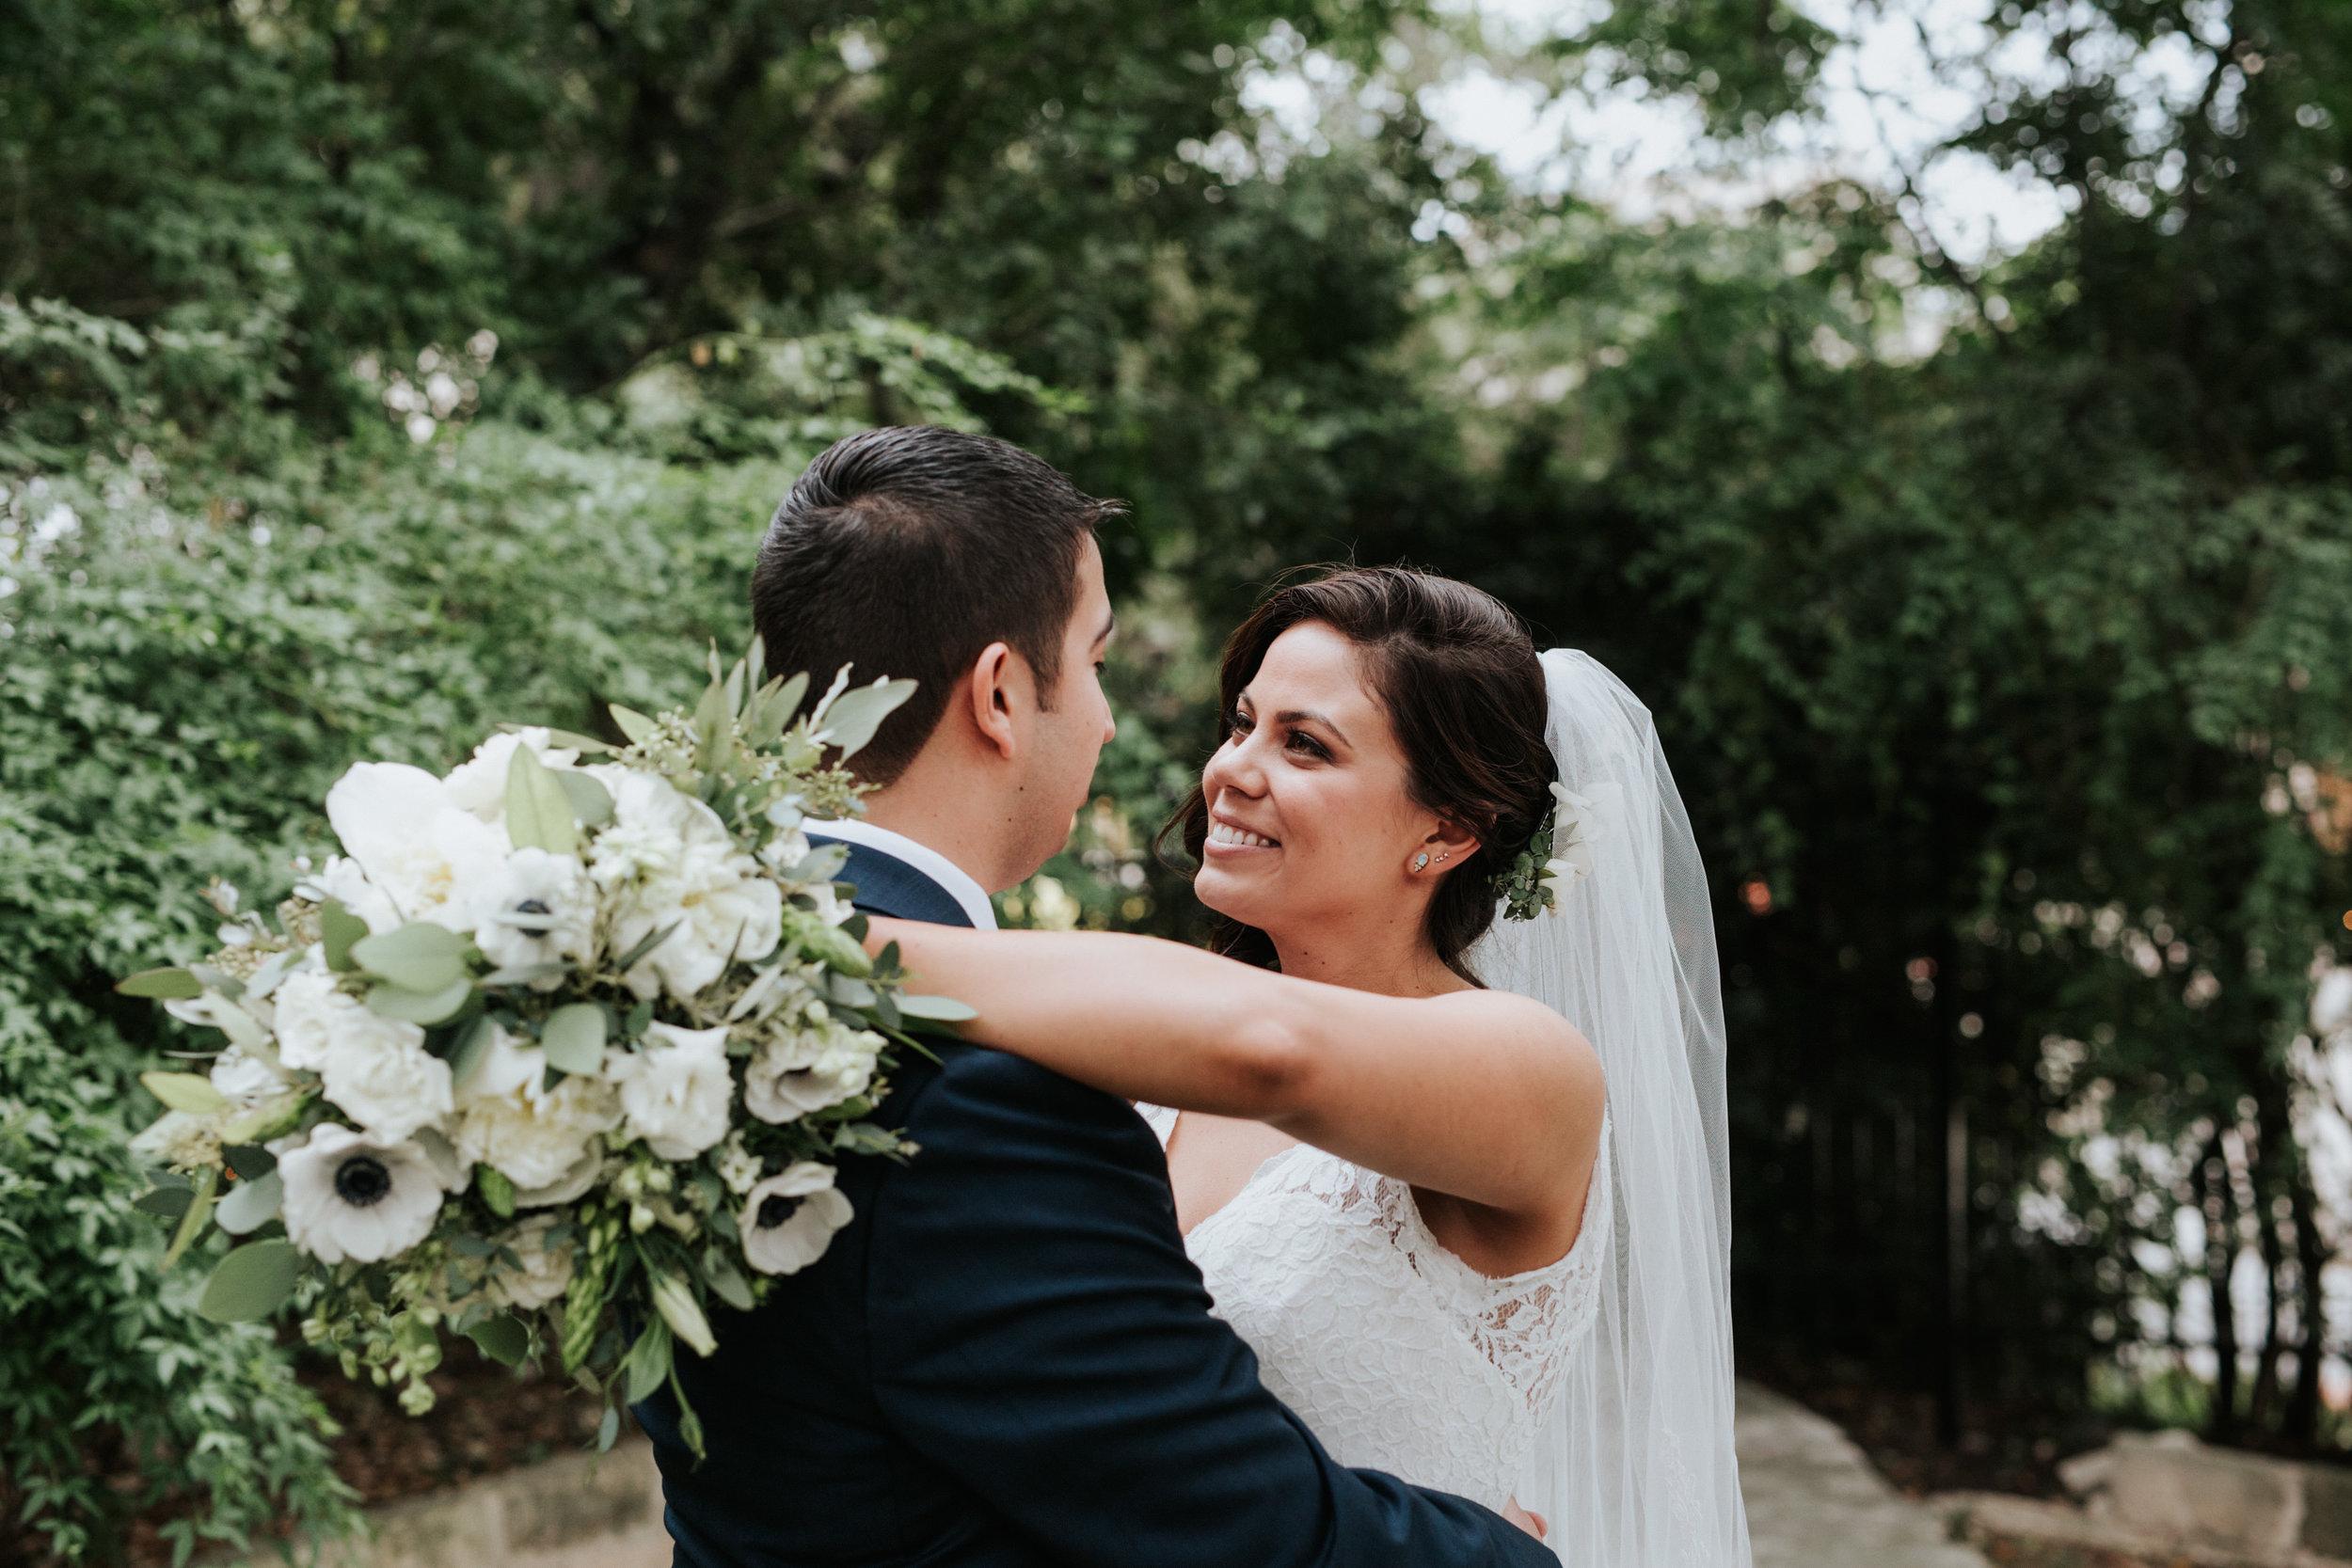 Ginny + Mando Wedding - Diana Ascarrunz Photography-886.JPG